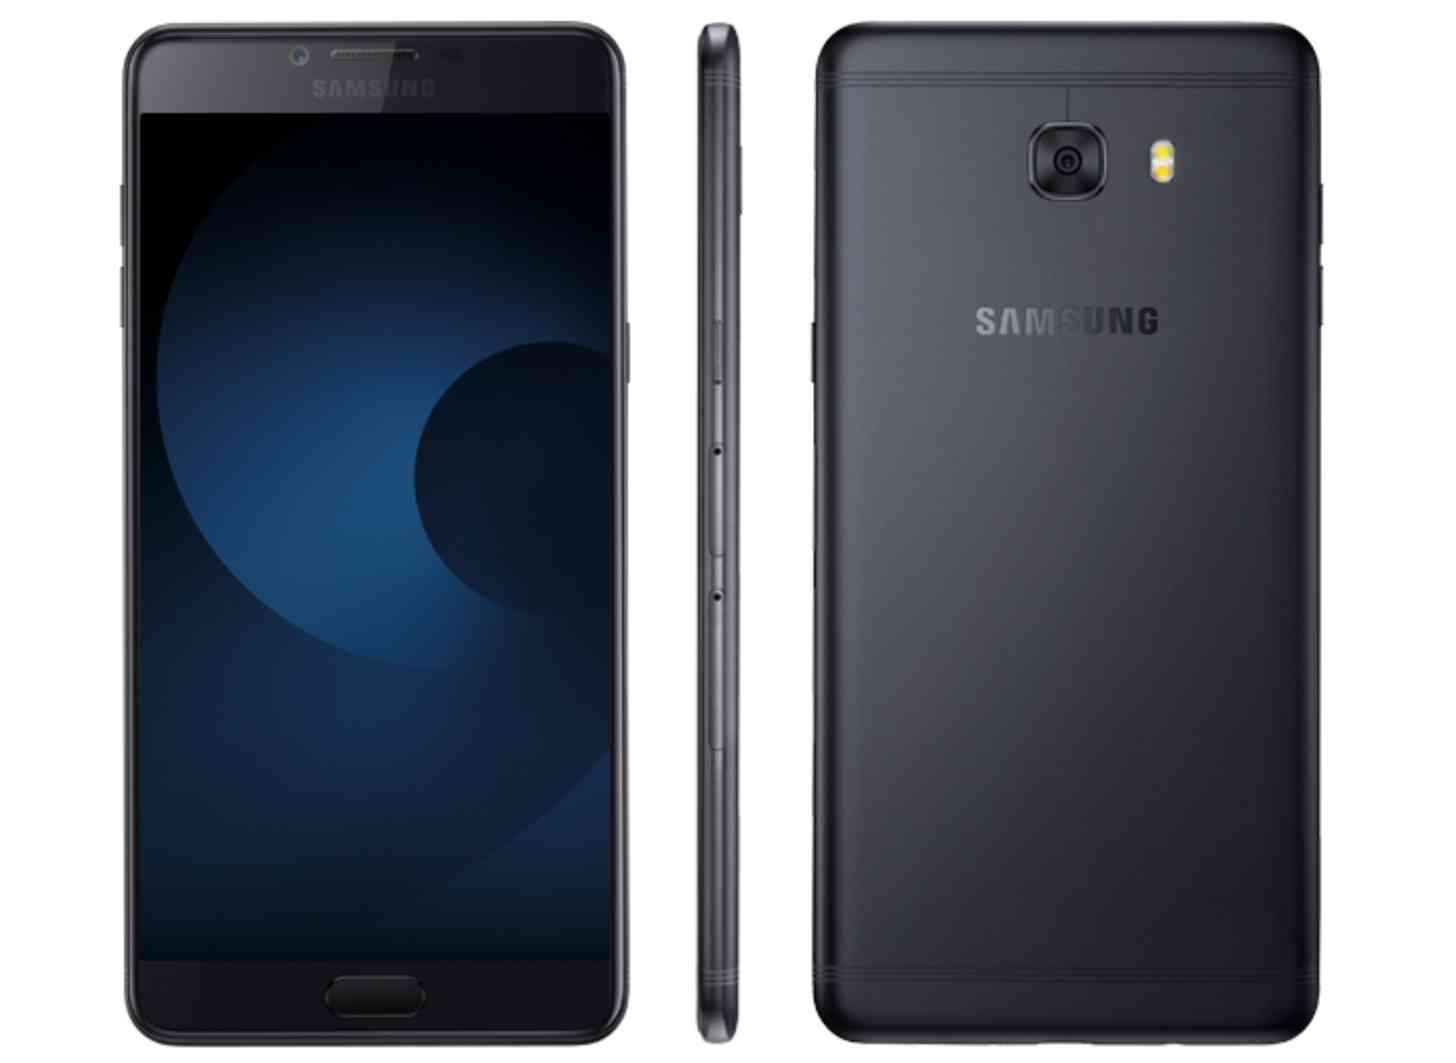 Обновлённый Самсунг Galaxy On5 (2017) всё ближе крелизу